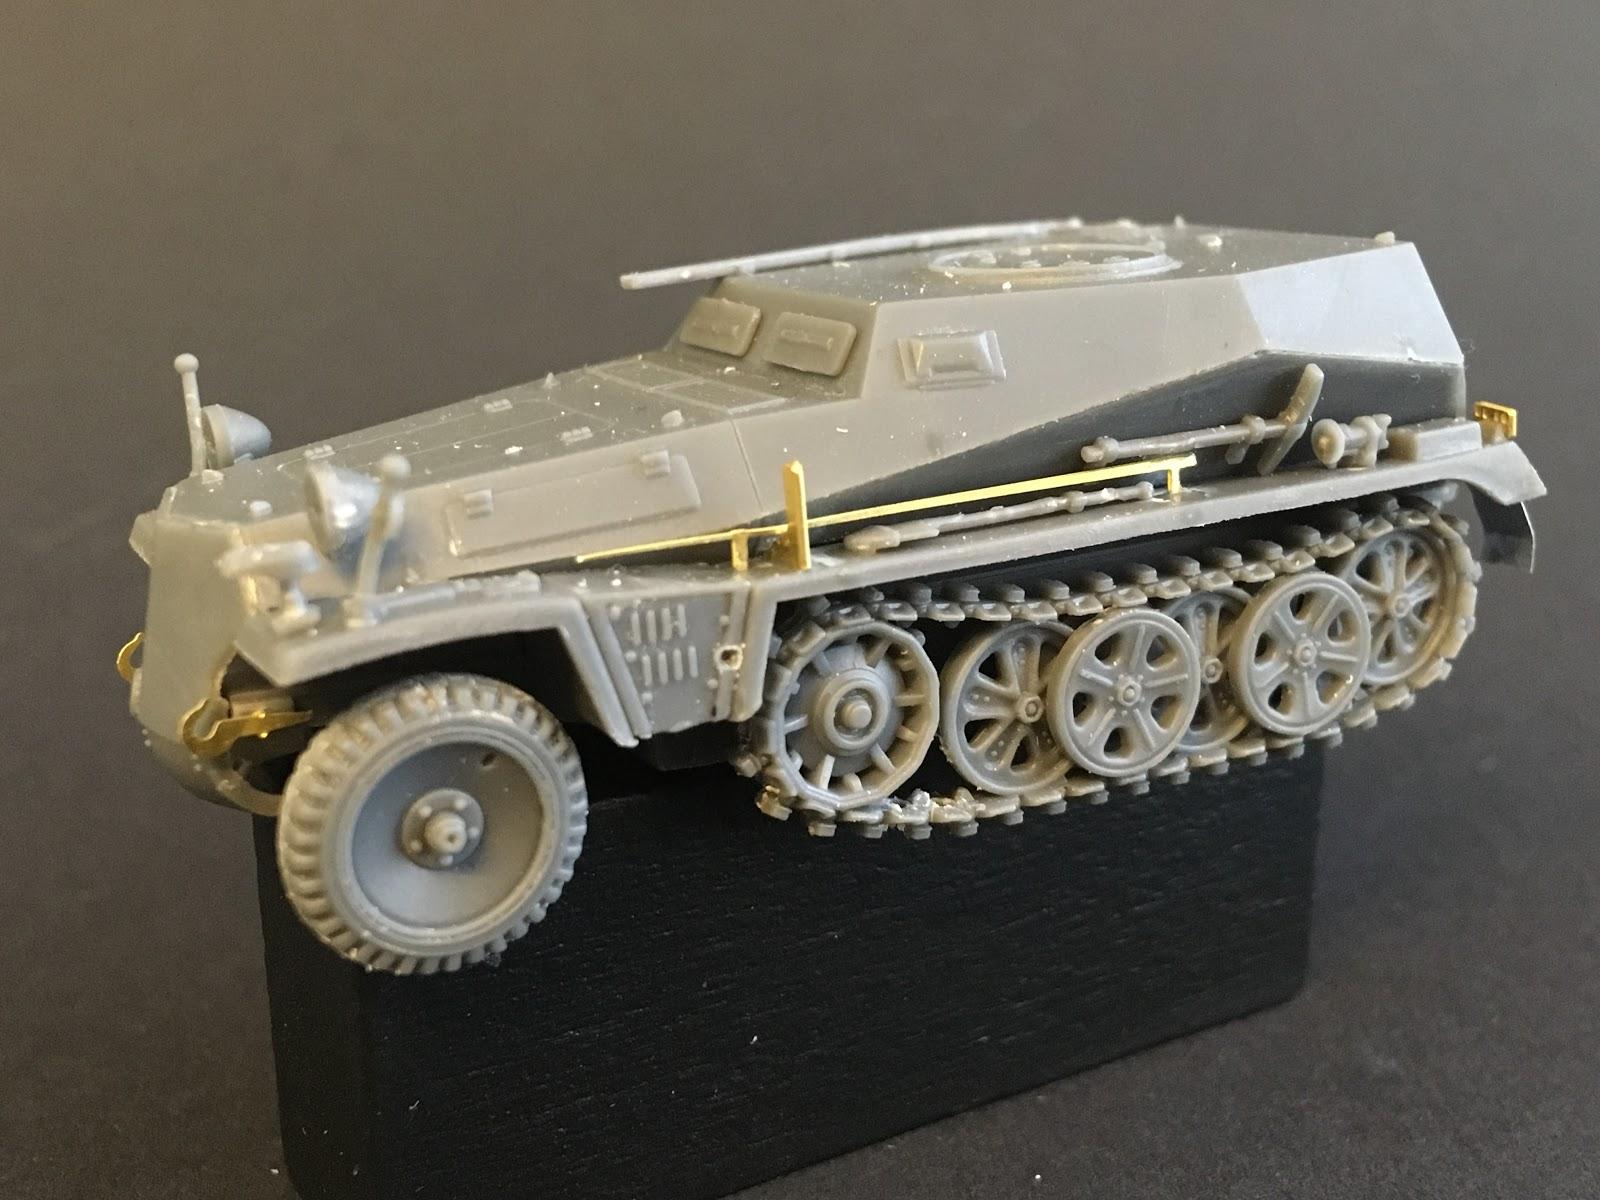 S-Model 1//72 German Sd.Kfz.253 Le Beob.Pz.Wg Artillery Observation Vehicle #0266